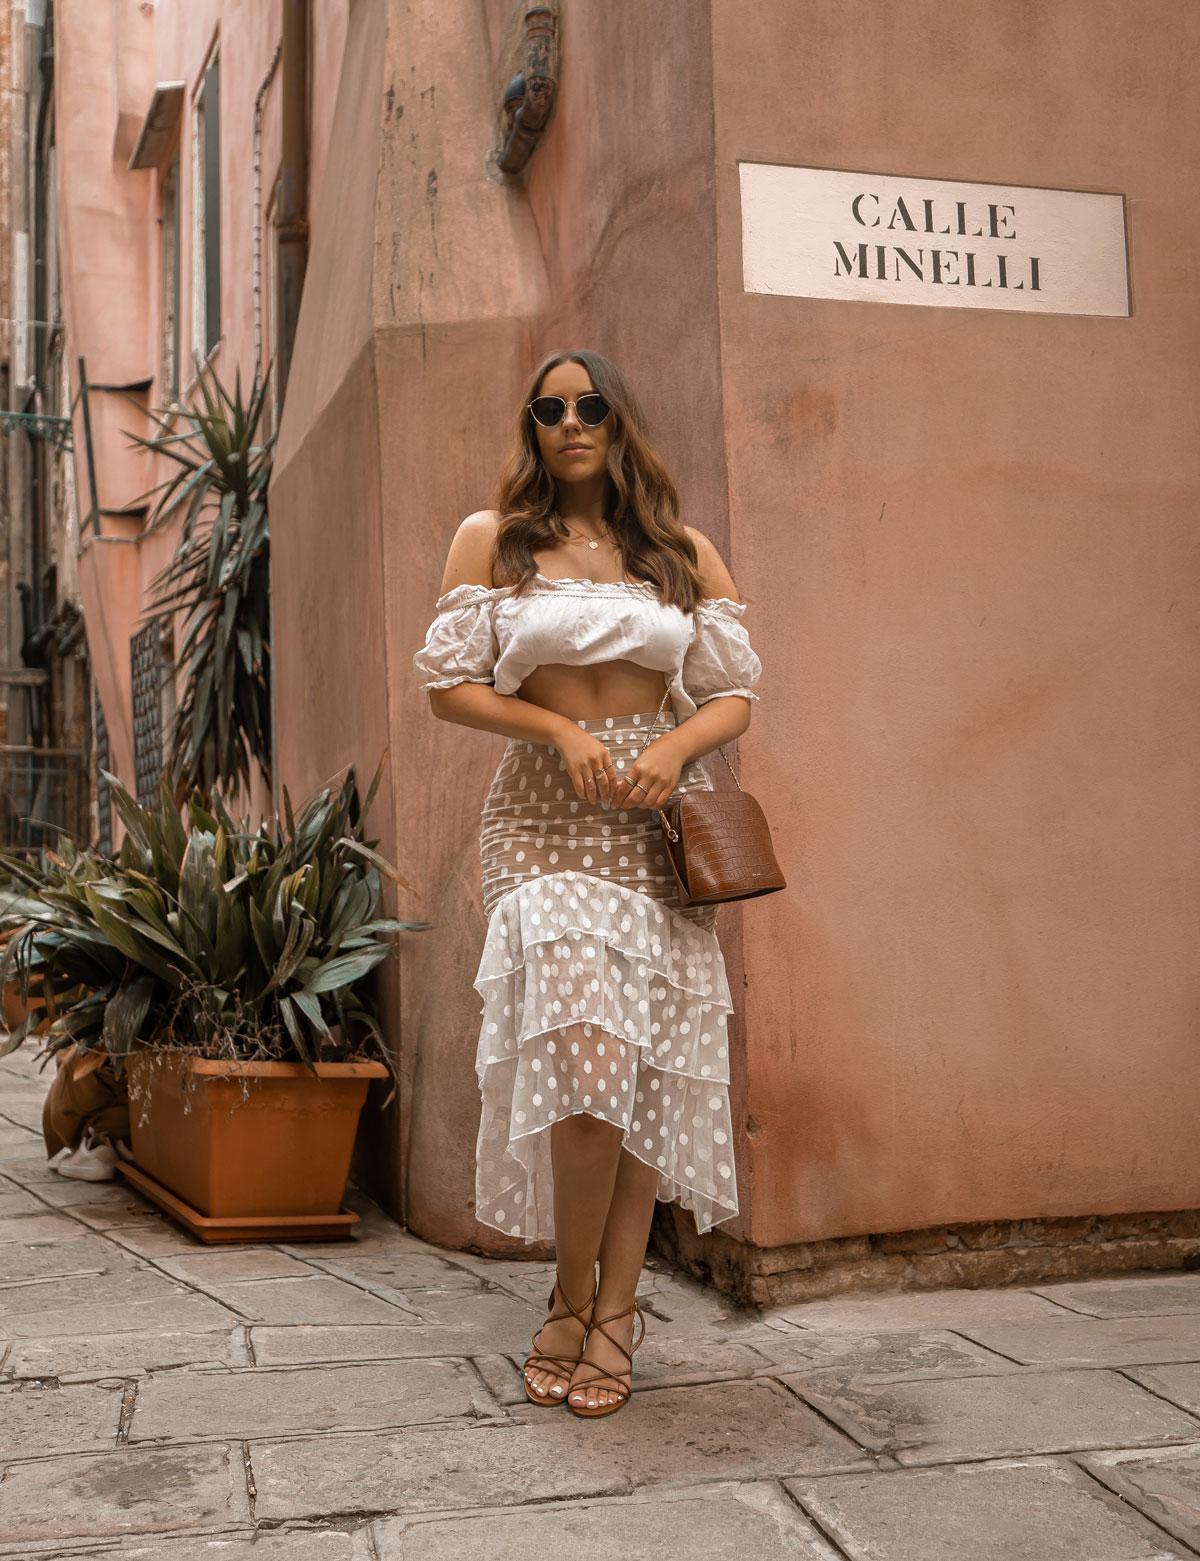 26-top-things-to-do-in-Venice---Venice-Instagram-spots-–-Venice-bucket-list---kelseyinlondon---kelsey-heinrichs---venice-gondola-ride---venice-grand-canal